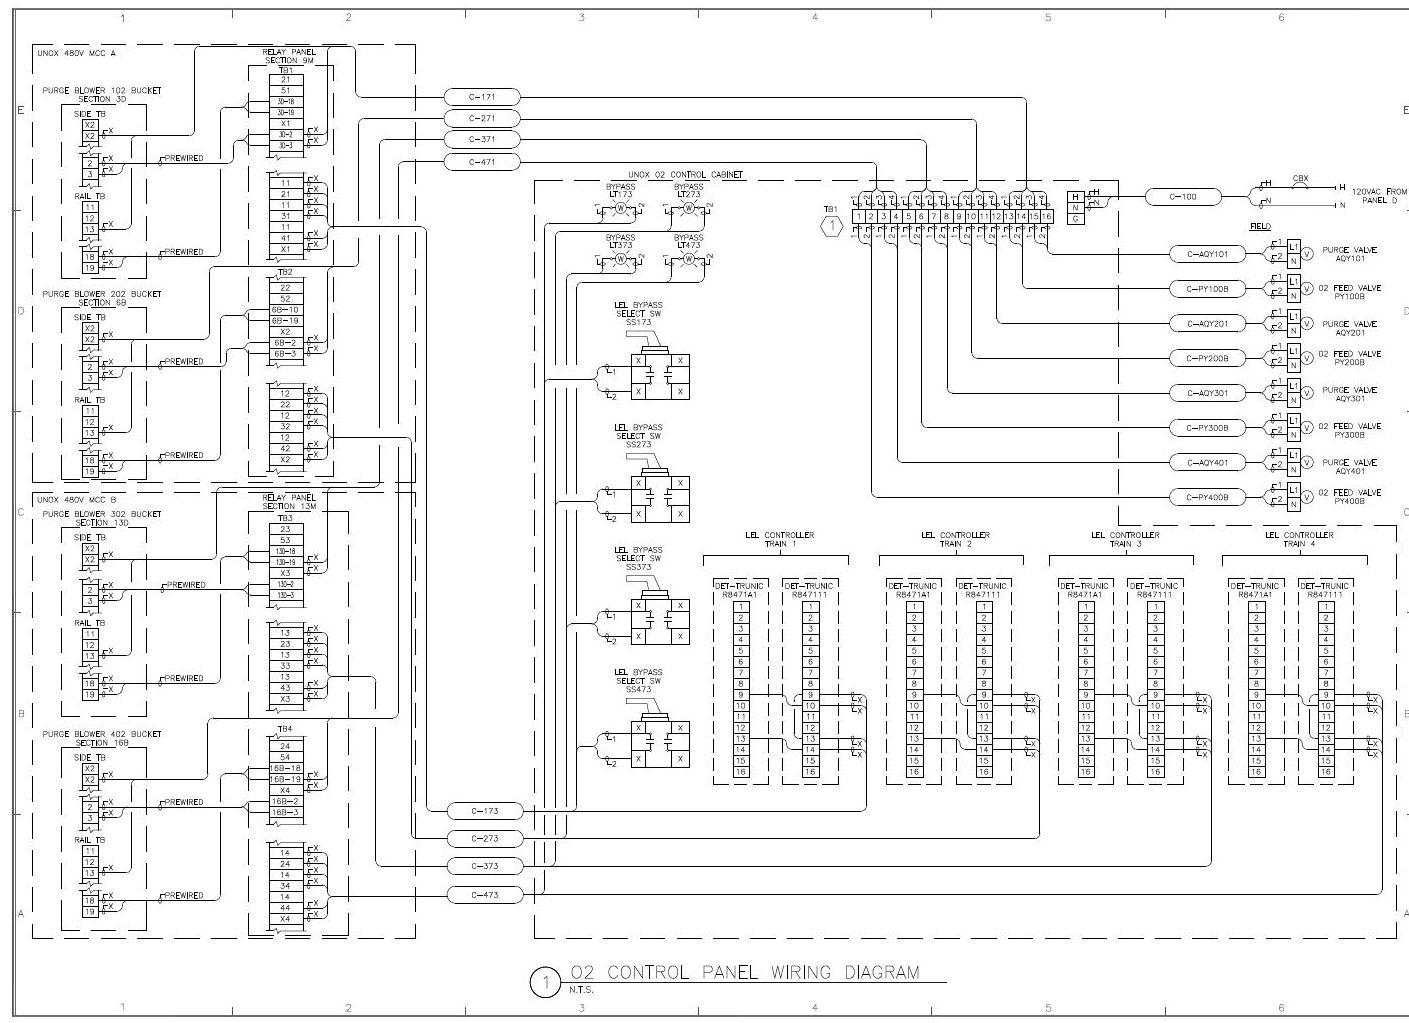 Wiring Diagram Siemens Imaging Equipment